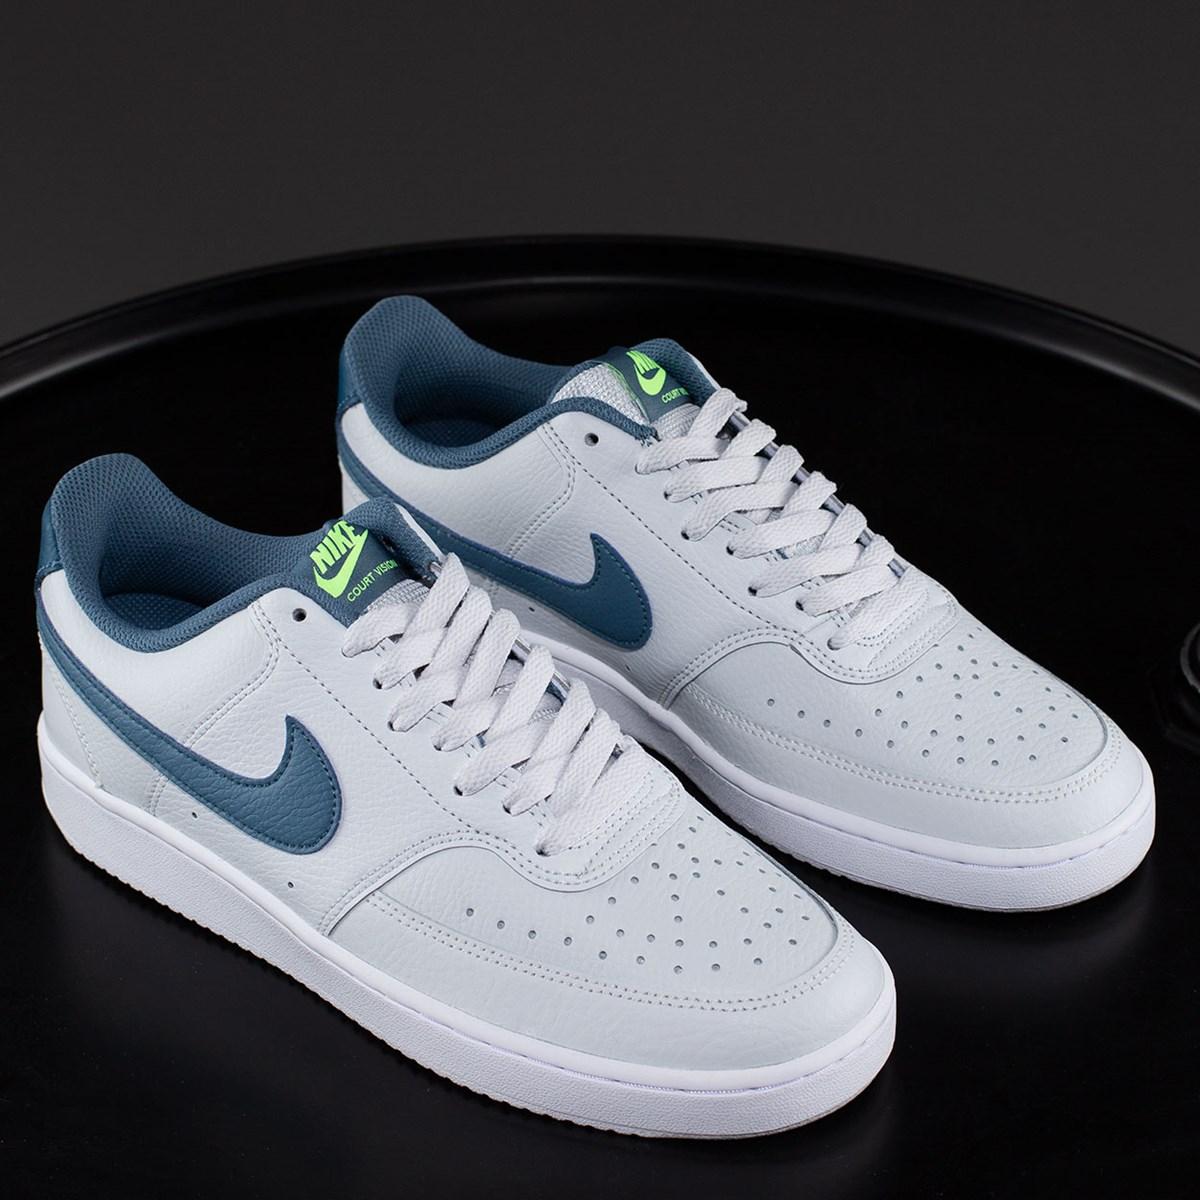 Tênis Nike Court Vision Low Photon Dust CD5463-005